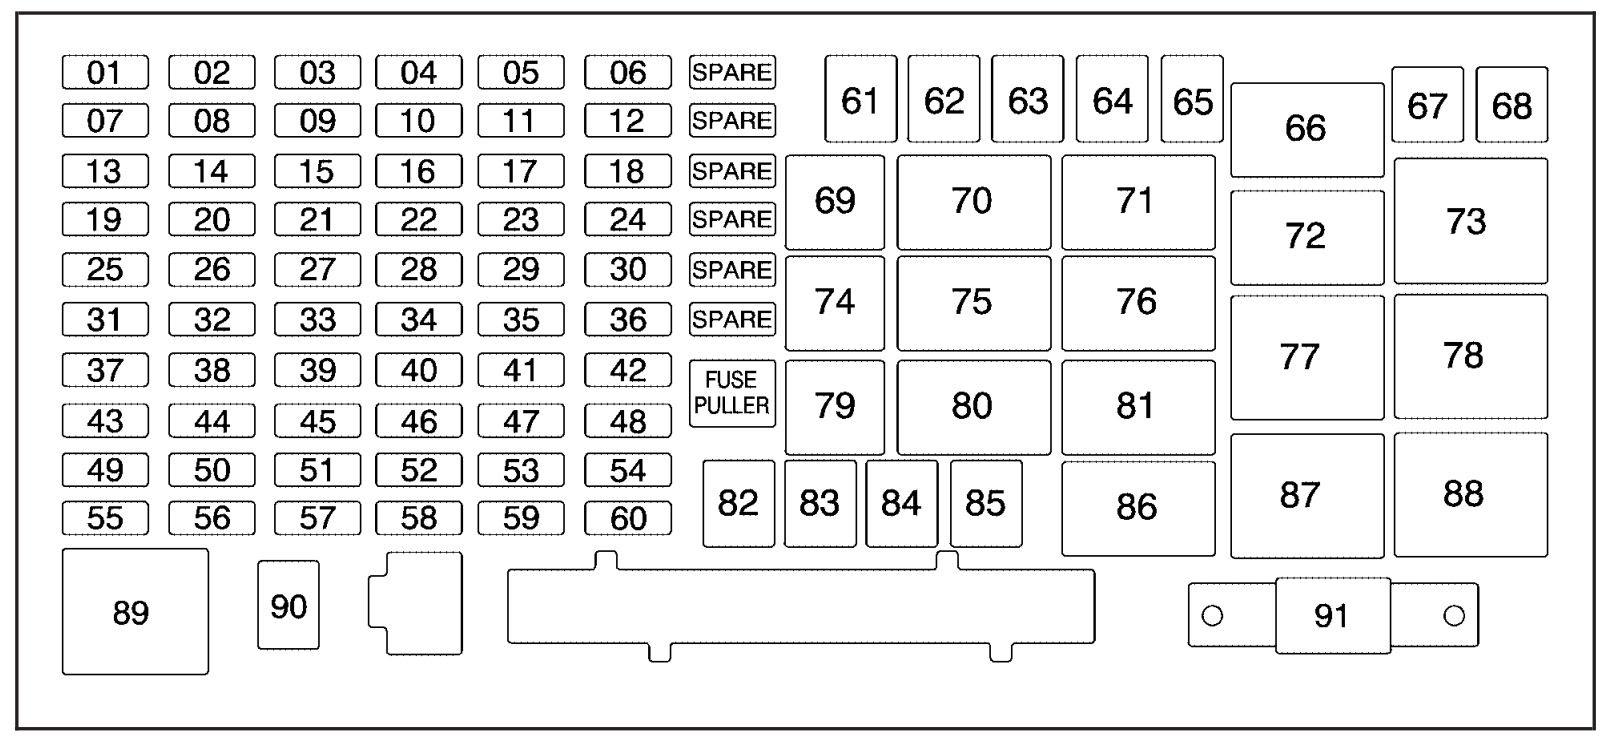 32 Hummer H1 Wiring Diagram